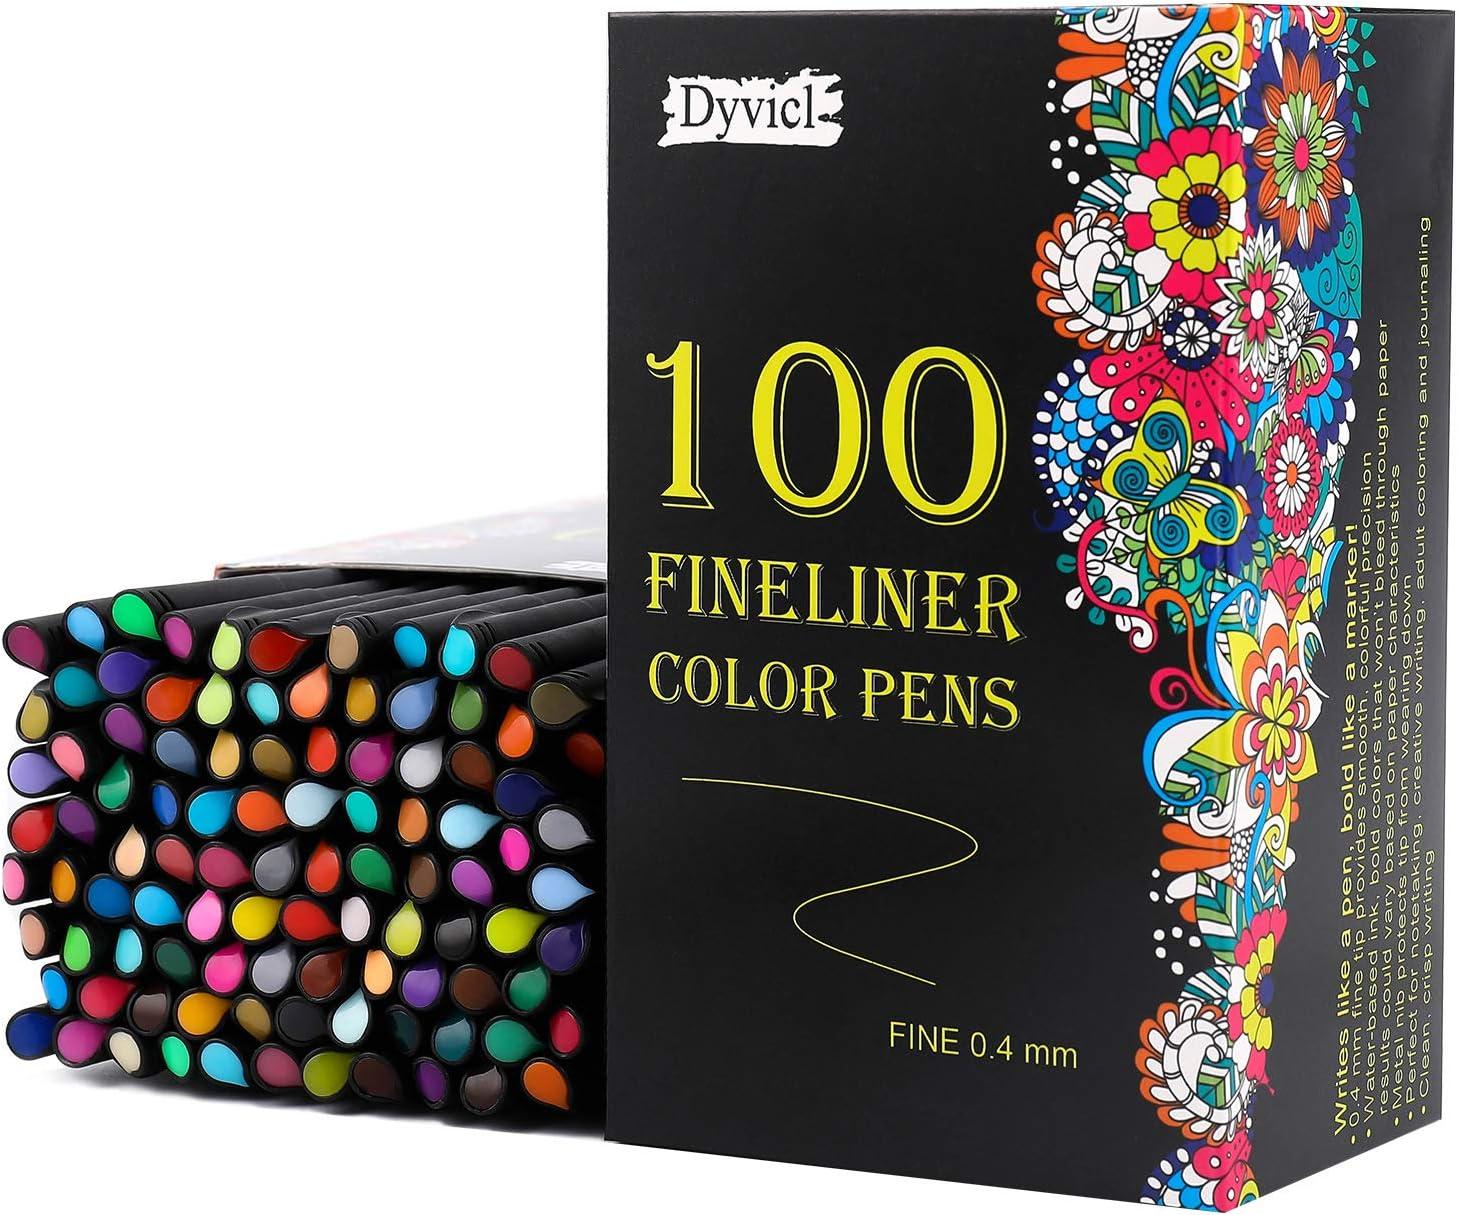 Fineliner Fine Point Pens